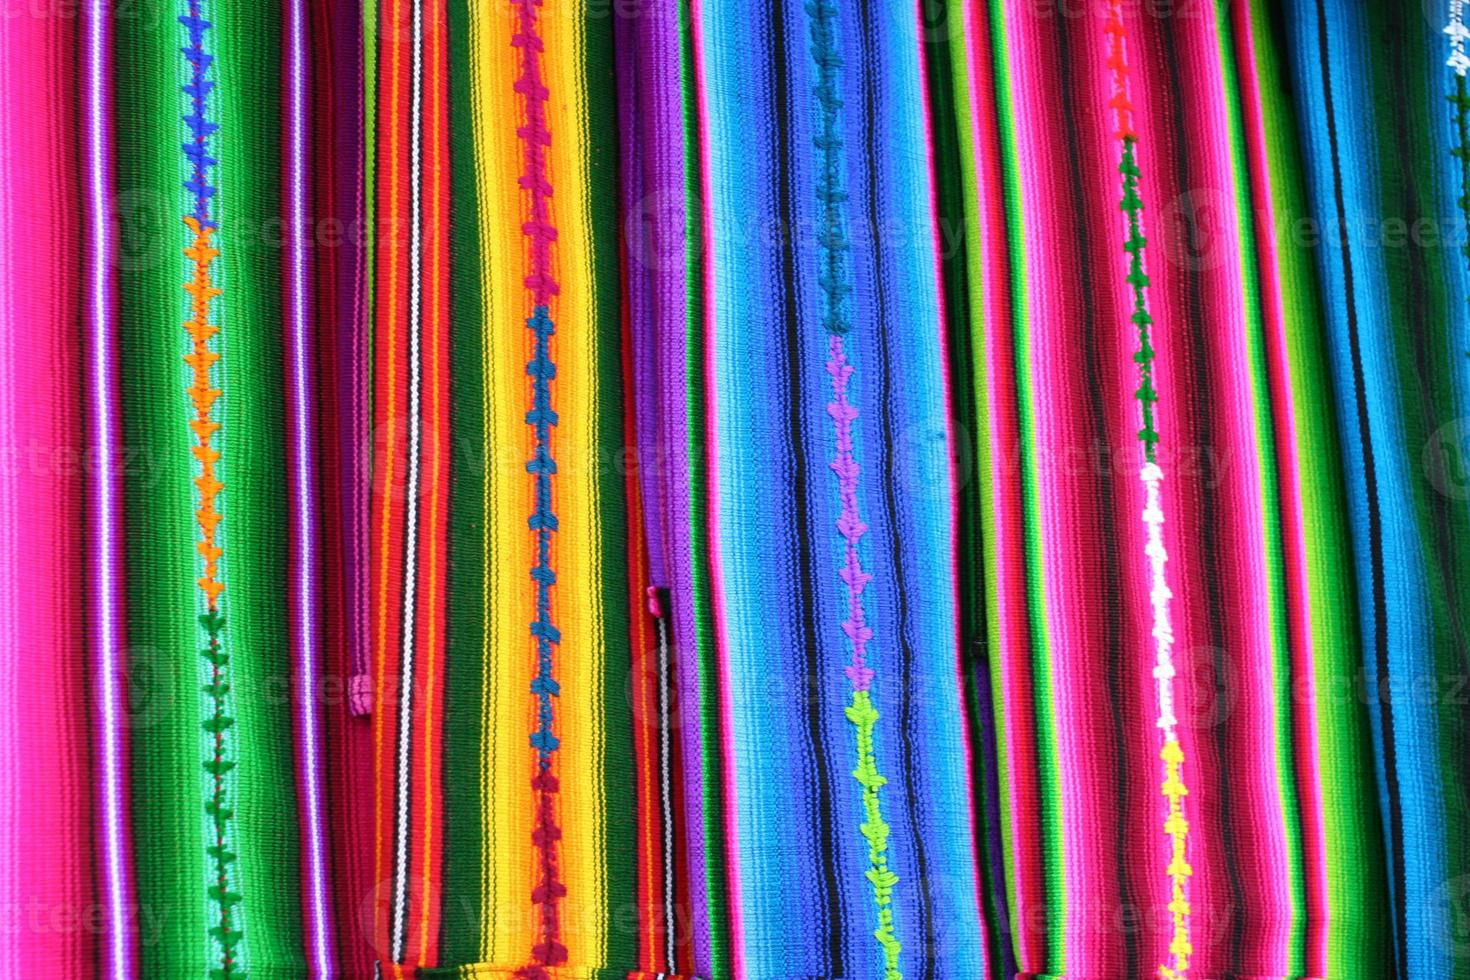 Colorful Guatemala Mayan Textiles in Antigua Market photo